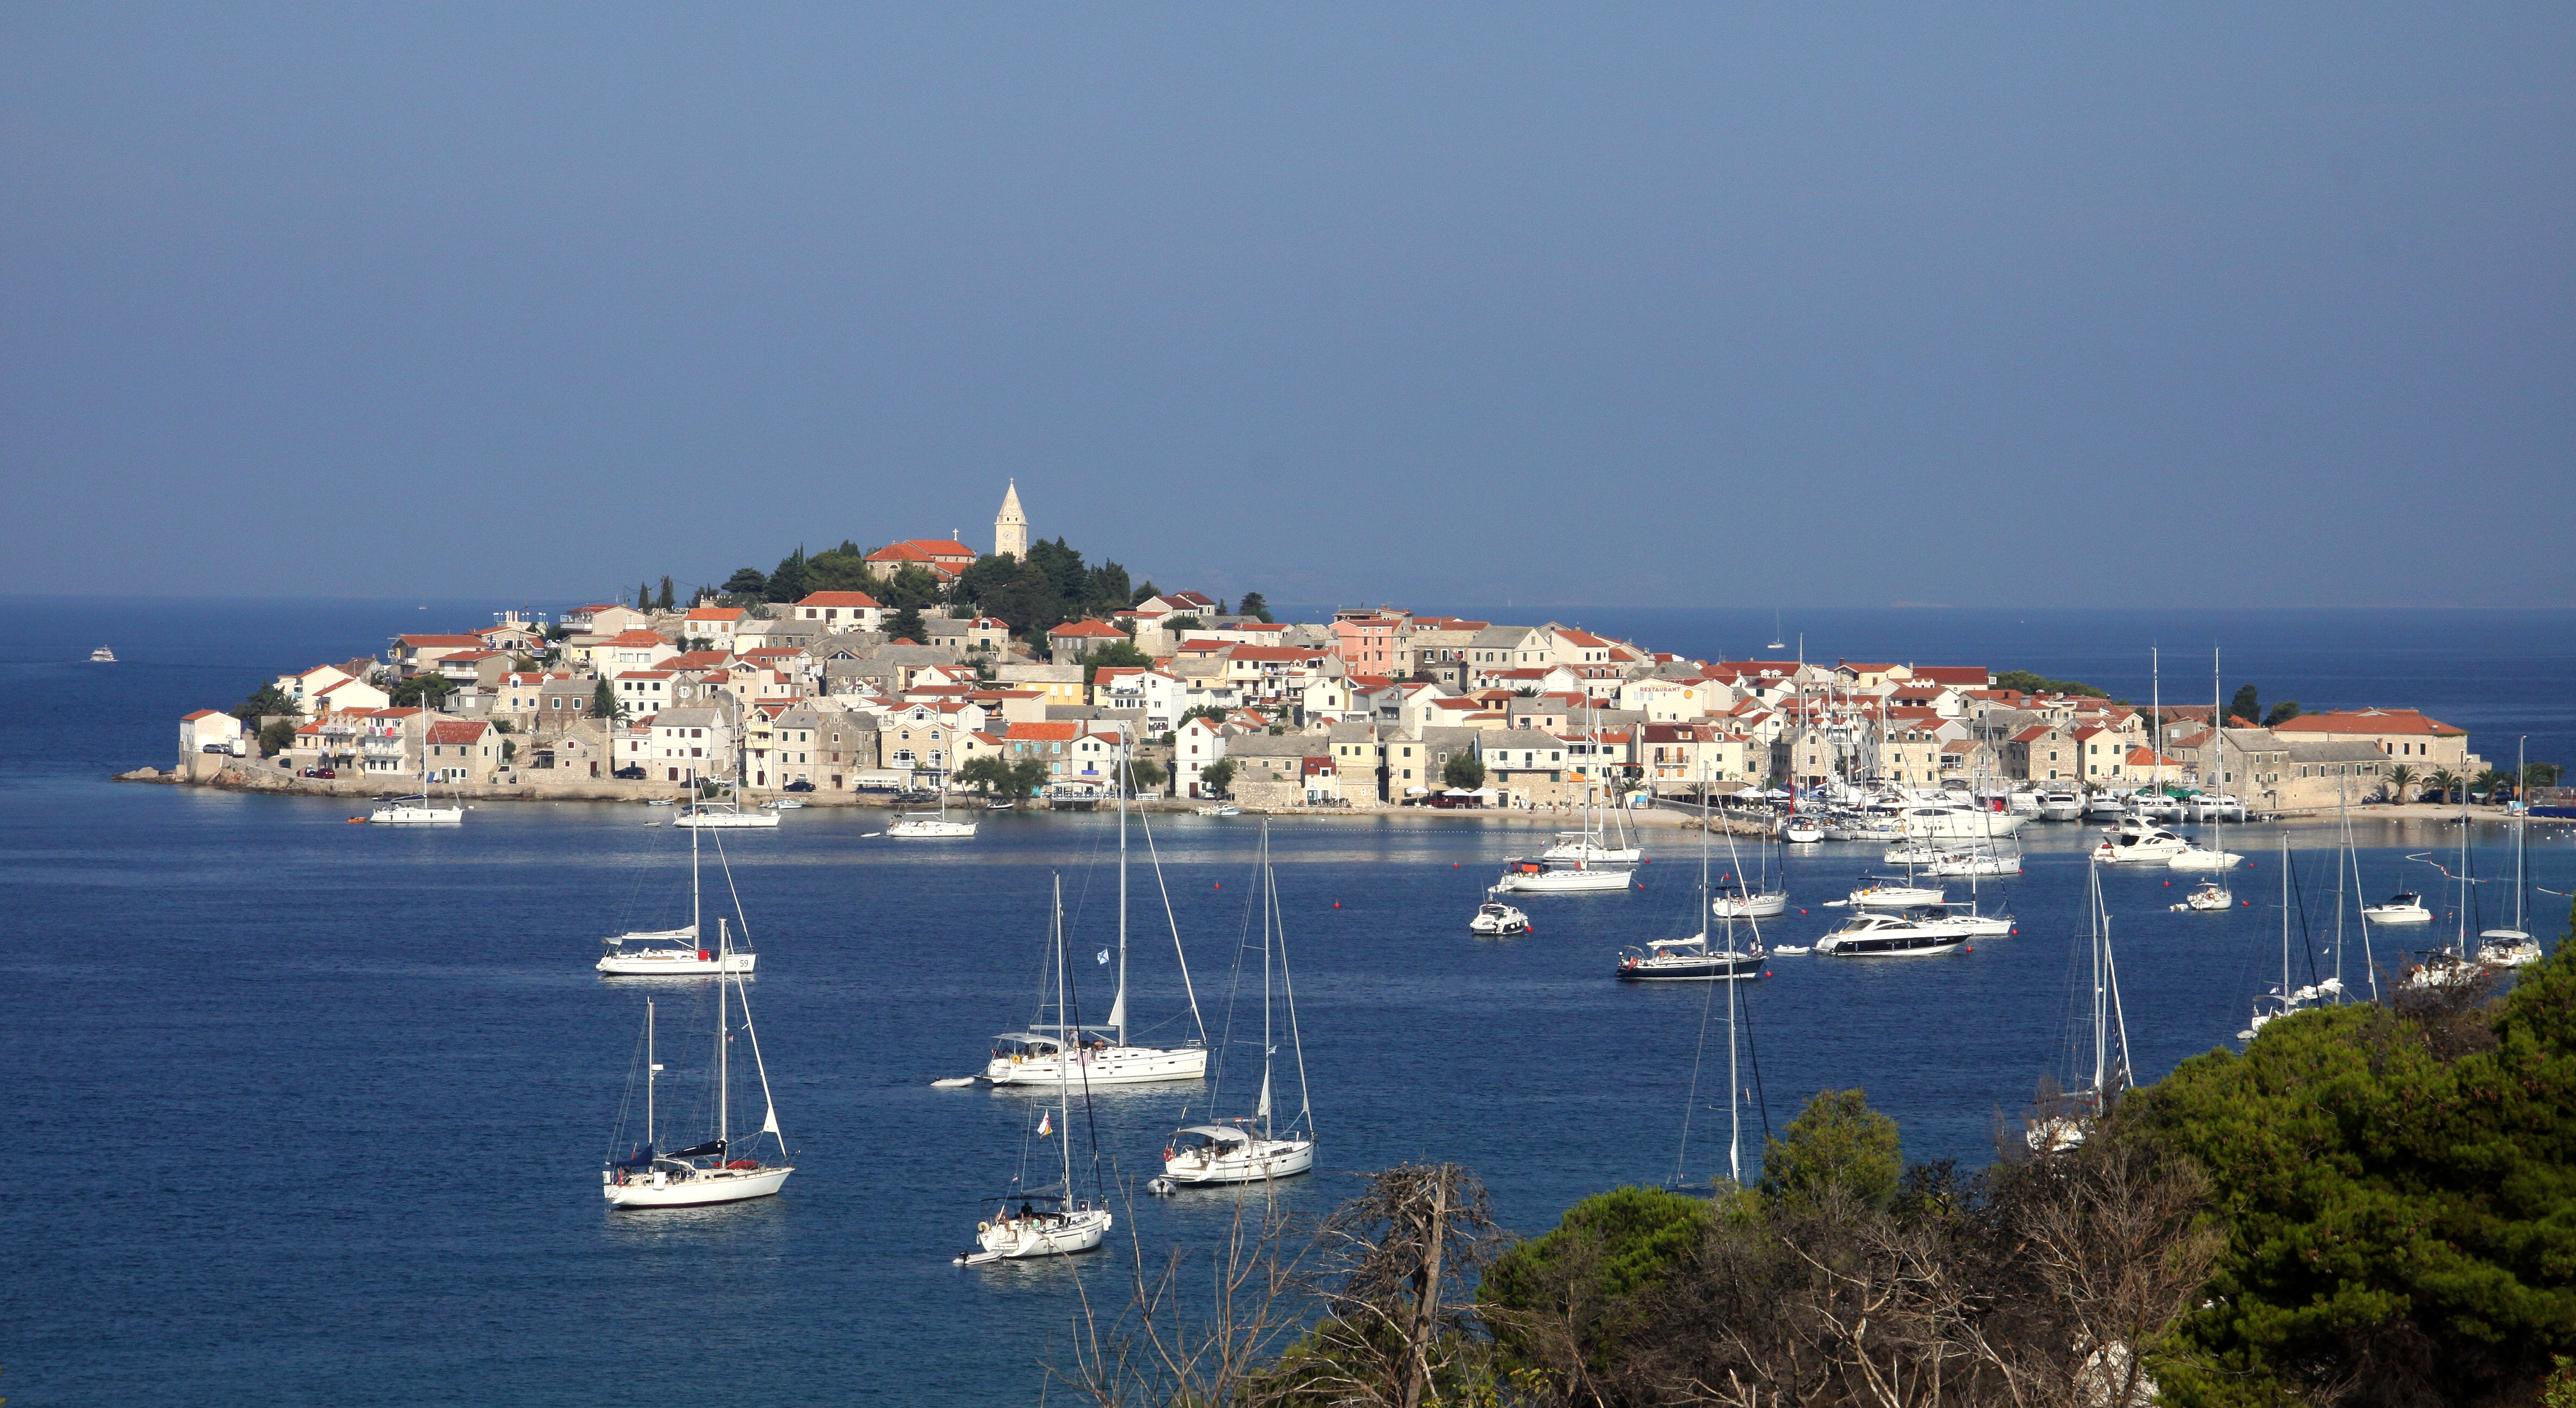 Yachts moored on blue waters in Croatia